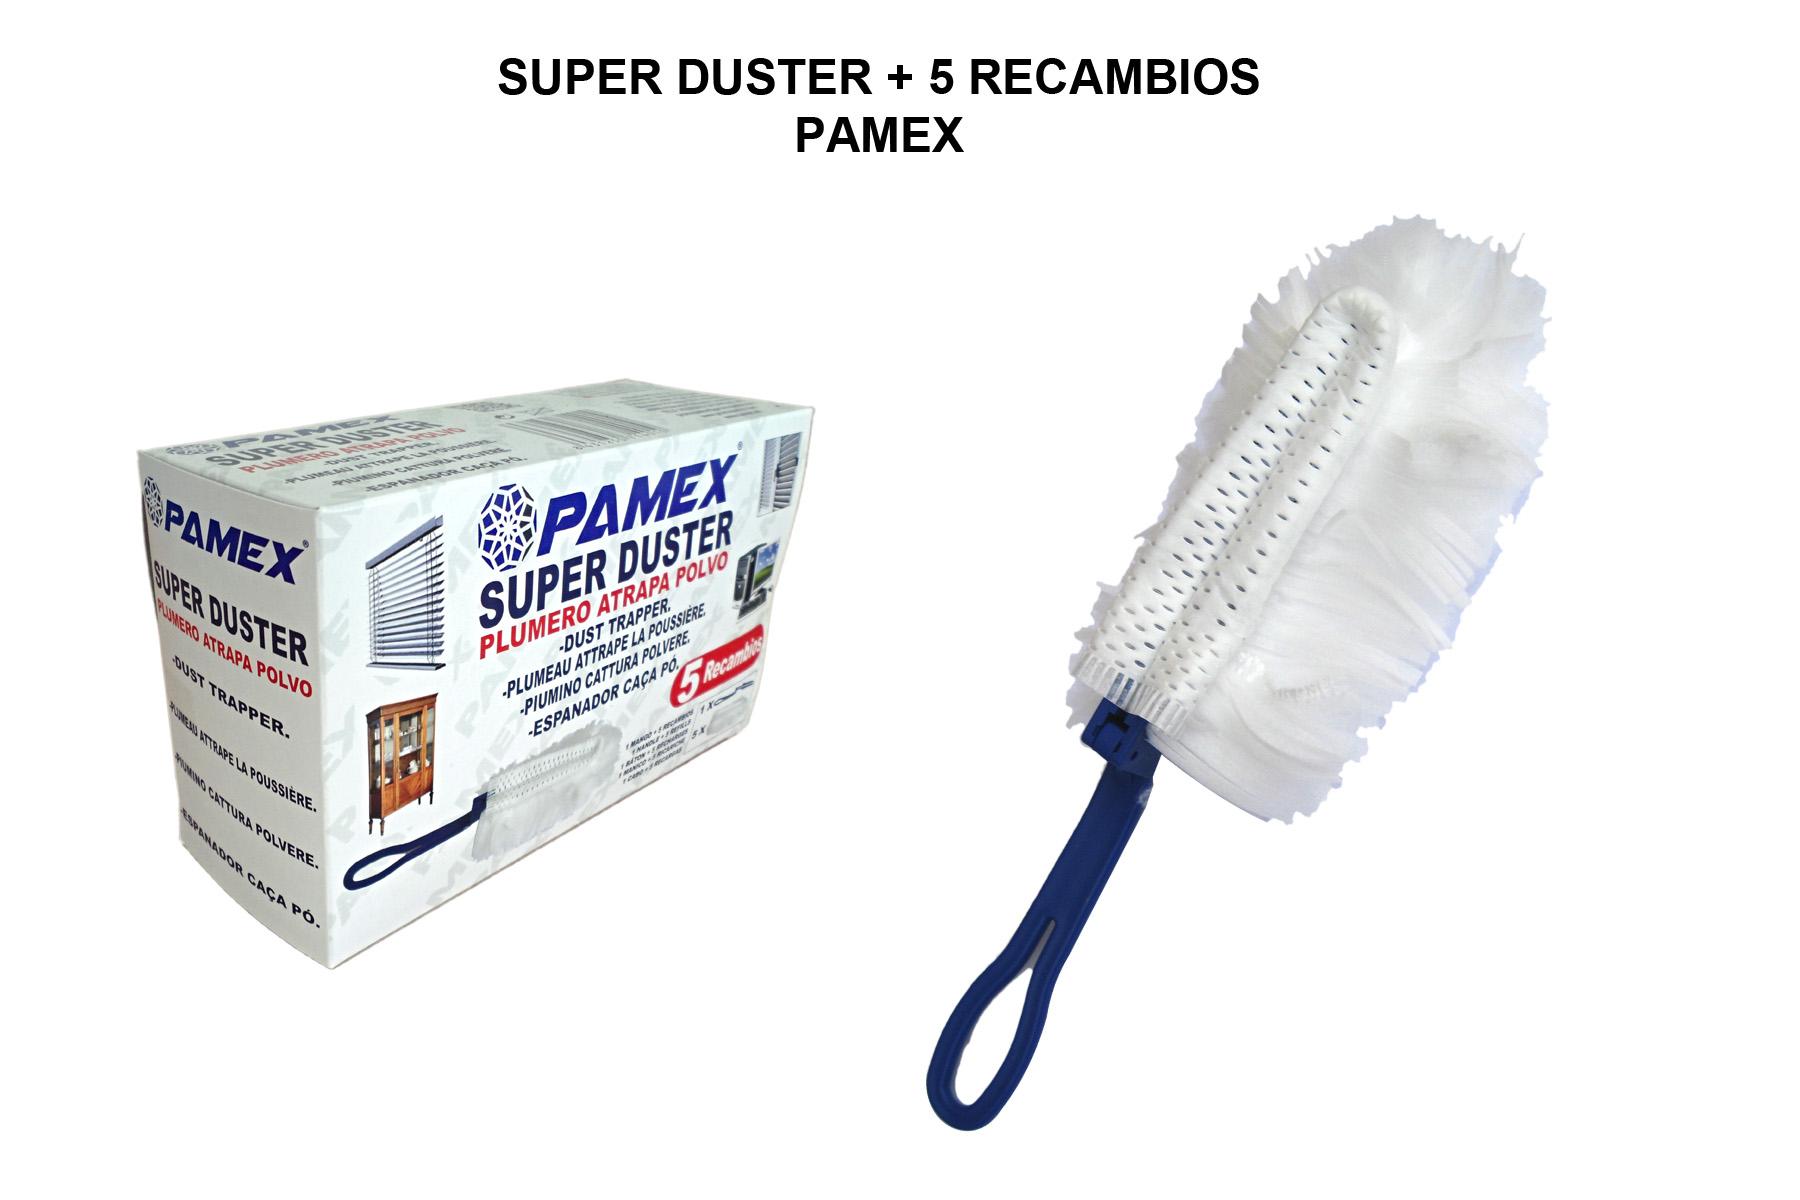 SUPER DUSTER + 5 RECAMBIOS PAMEX